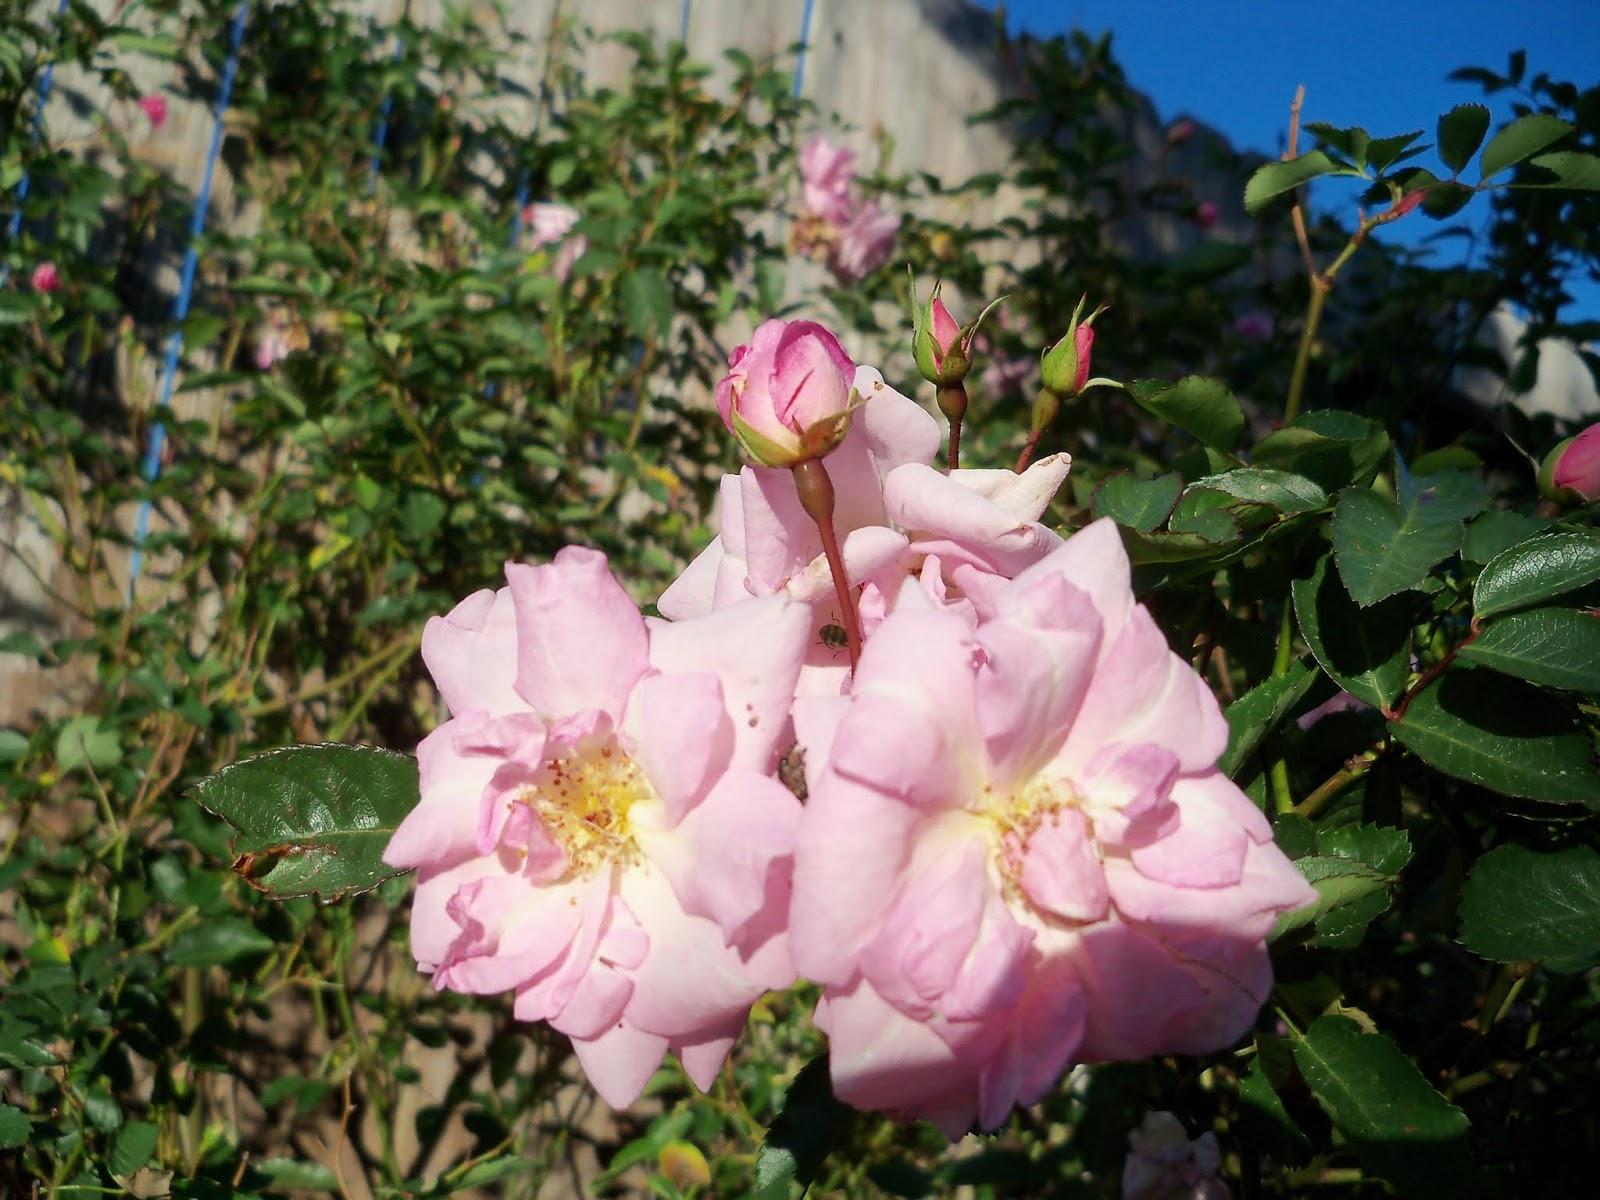 Gardening 2013 - 115_5448.JPG